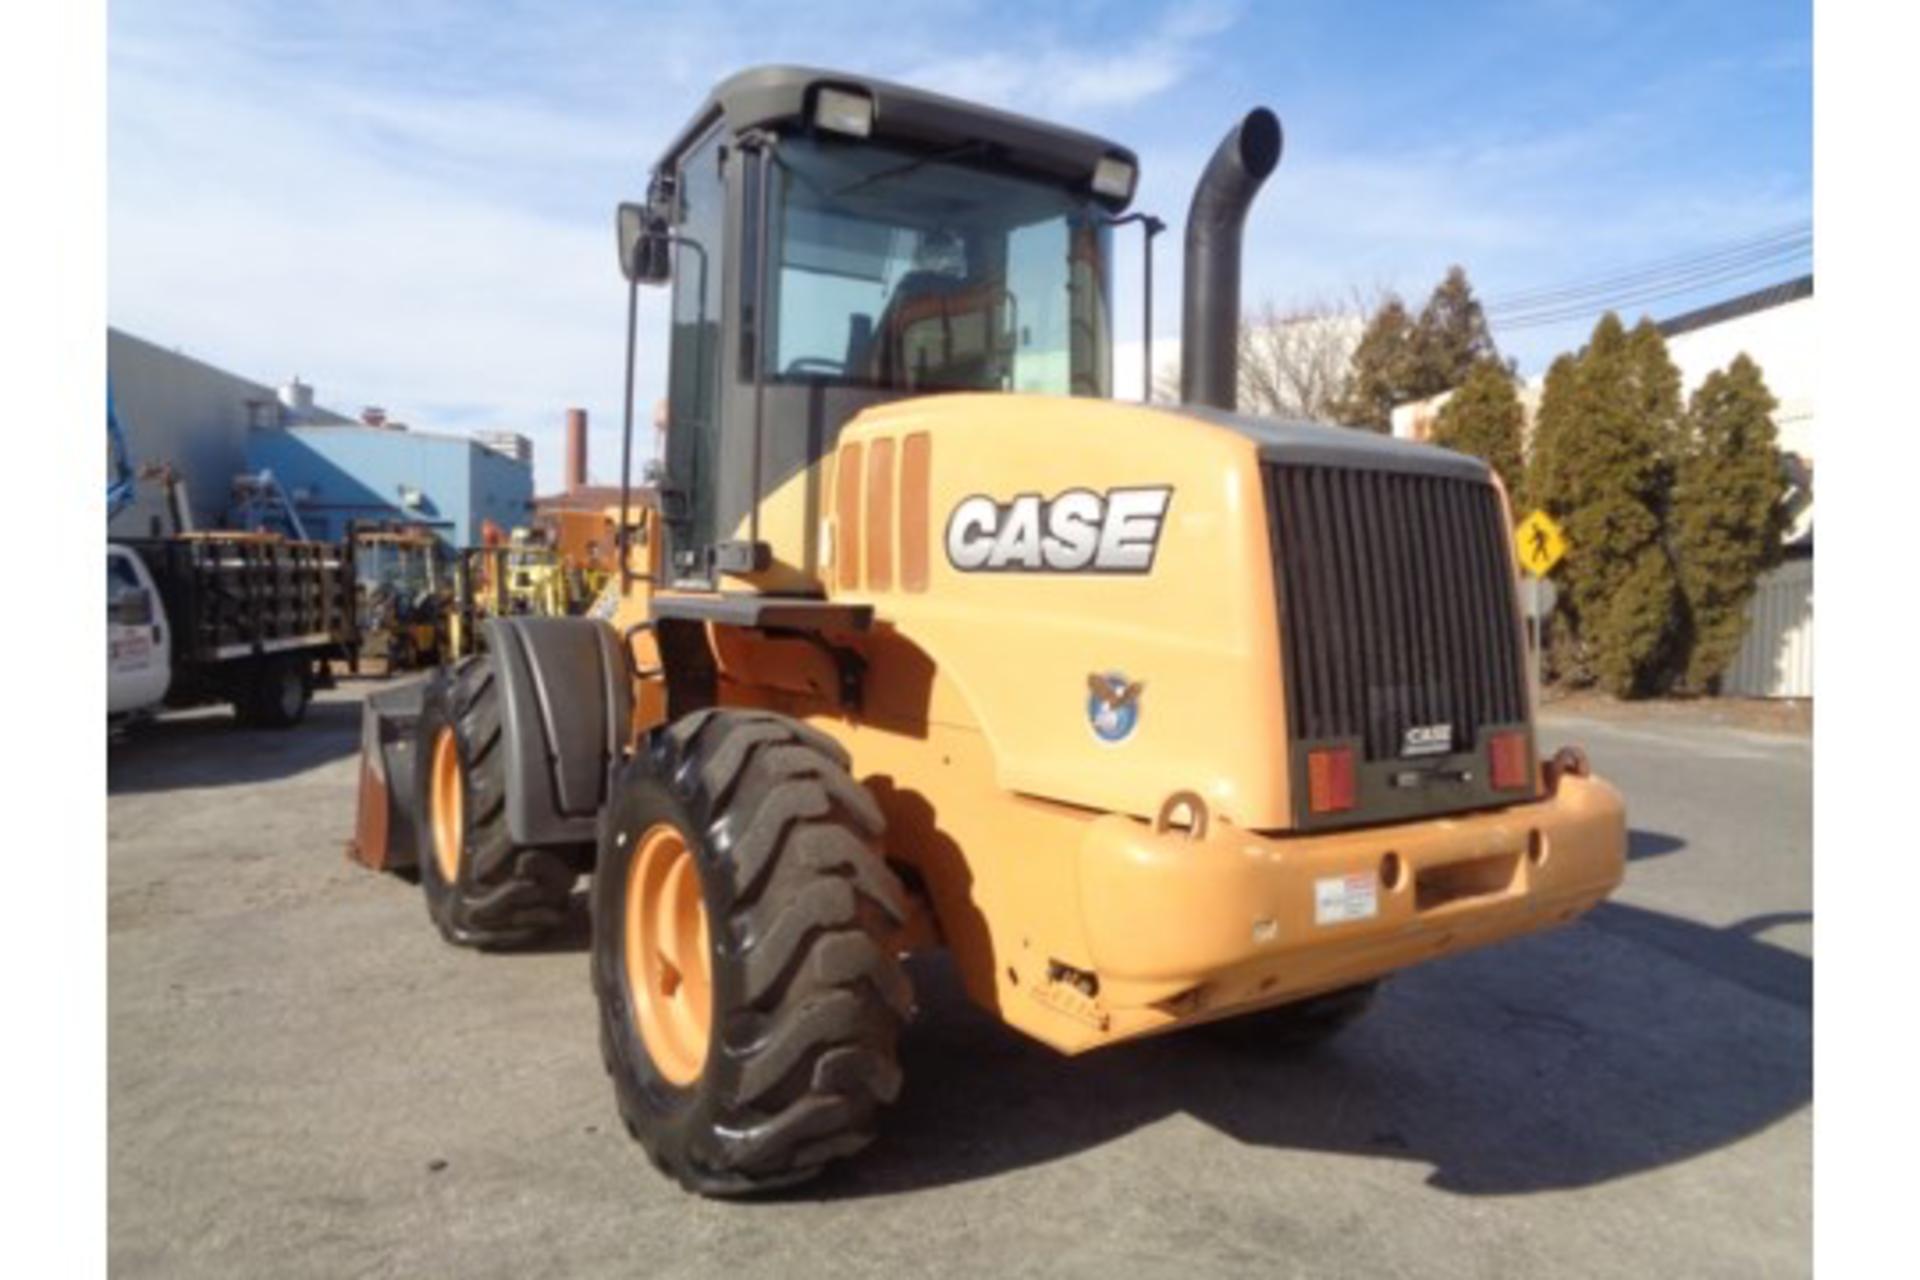 Lot 32 - 2013 Case 521E Wheel Loader - Only 762 Hours